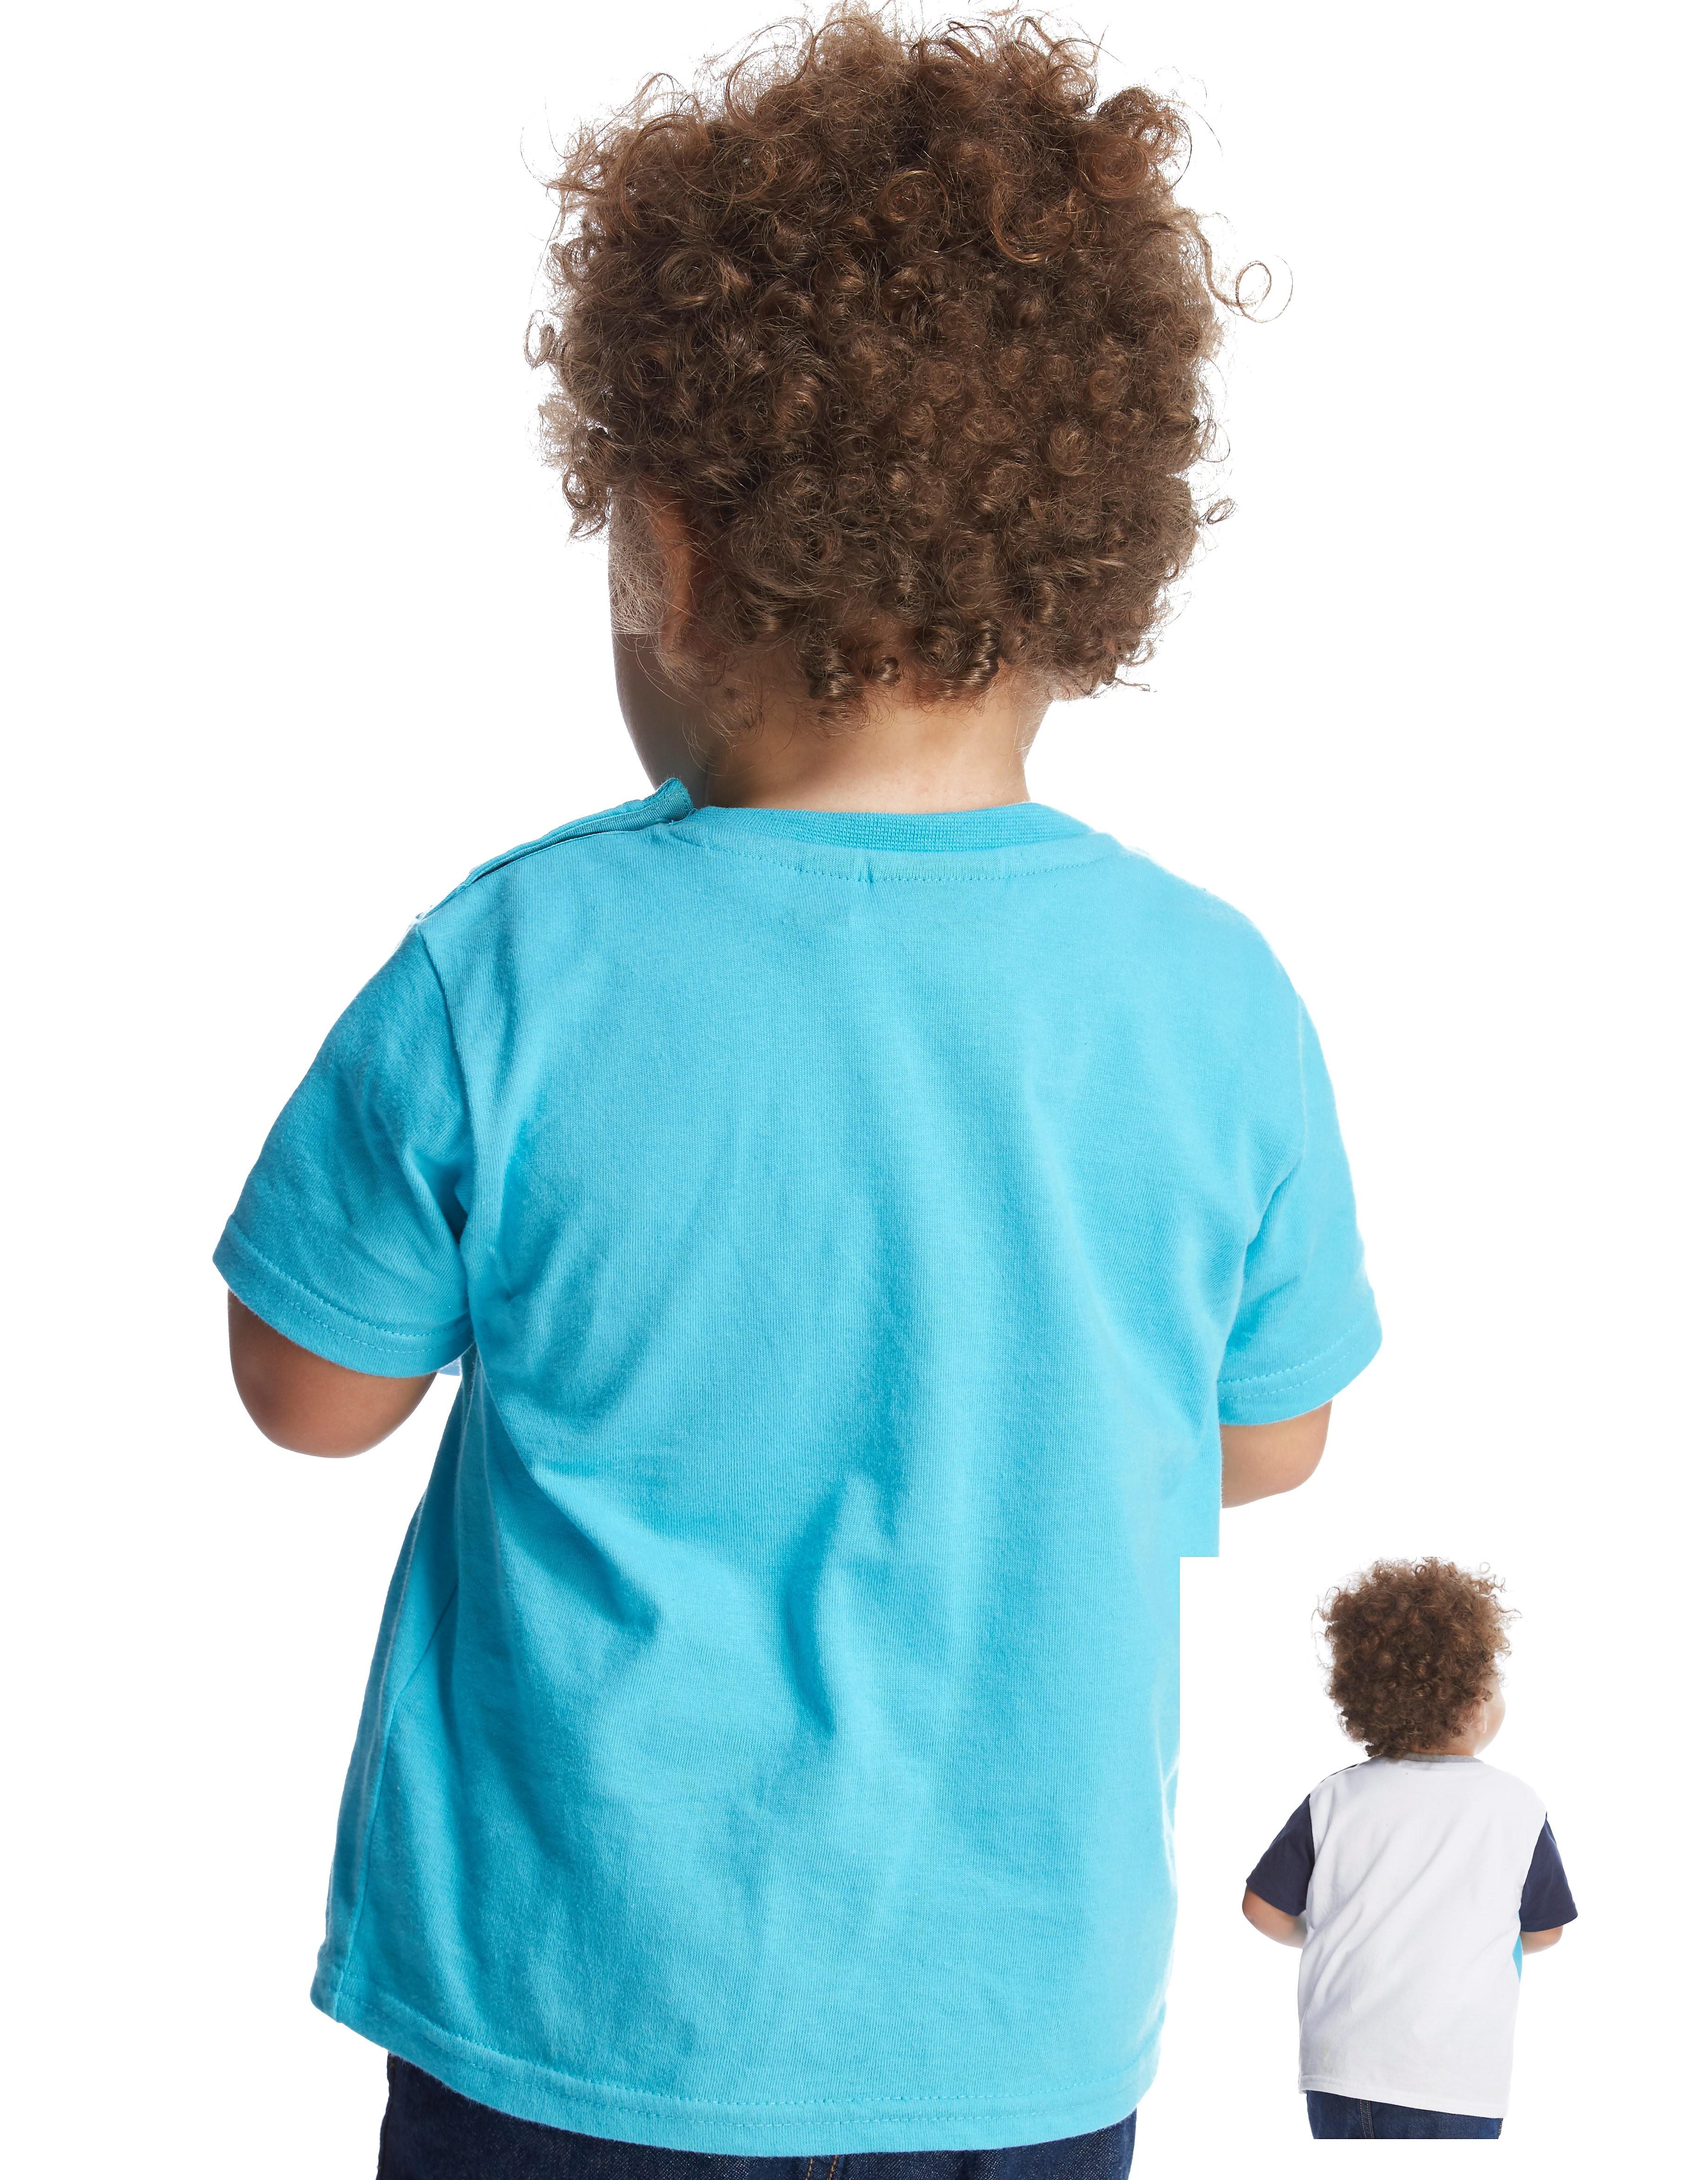 McKenzie Falcon 2 Packet T-Shirts Infant